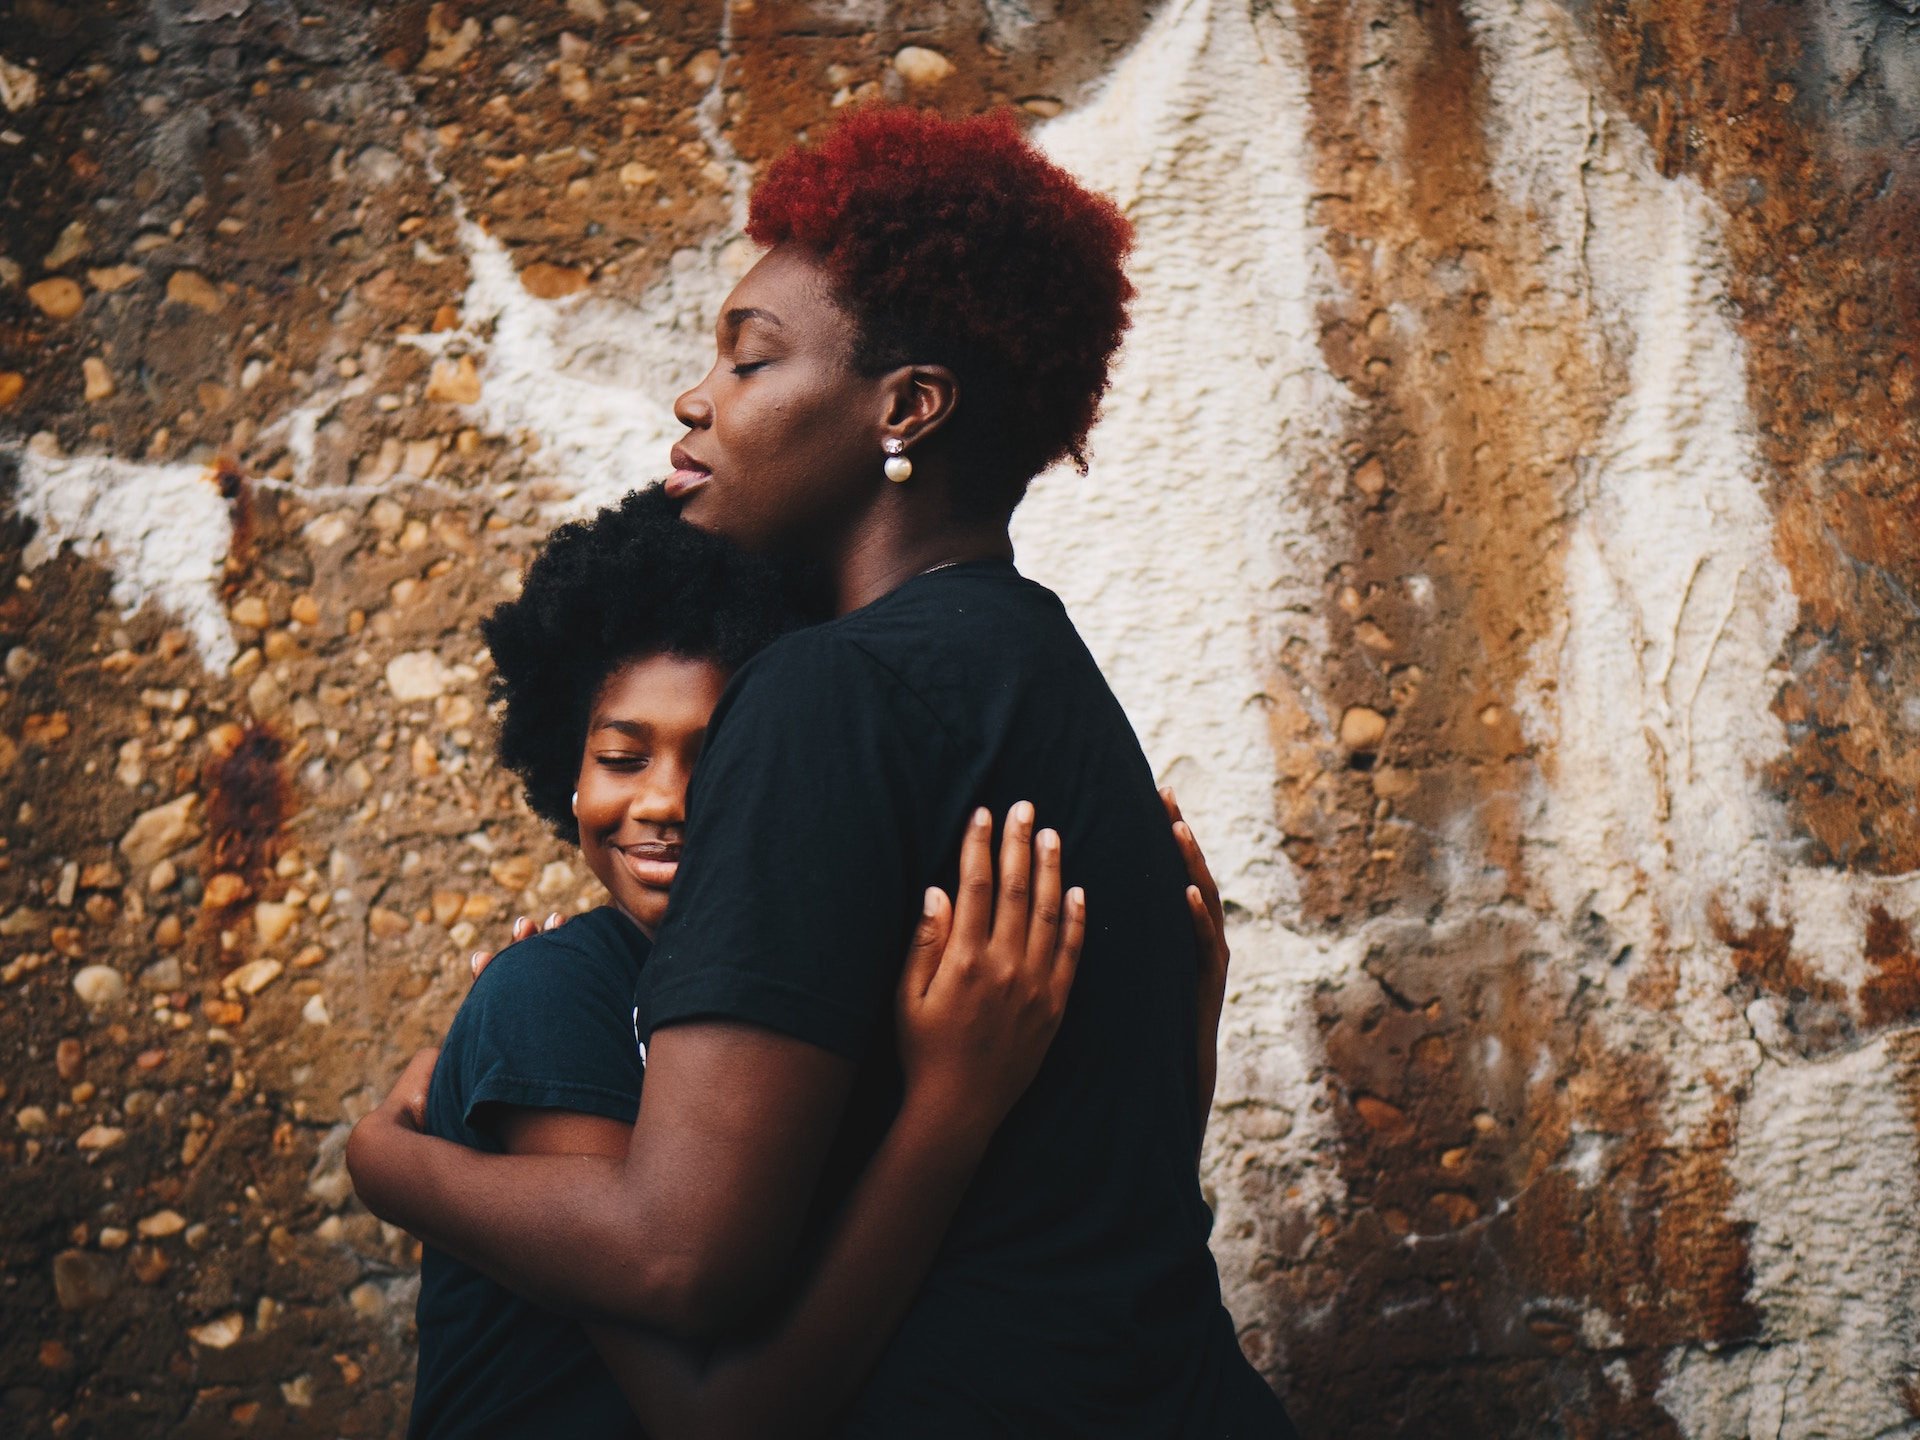 Understanding Different Types Of Attachment | Betterhelp